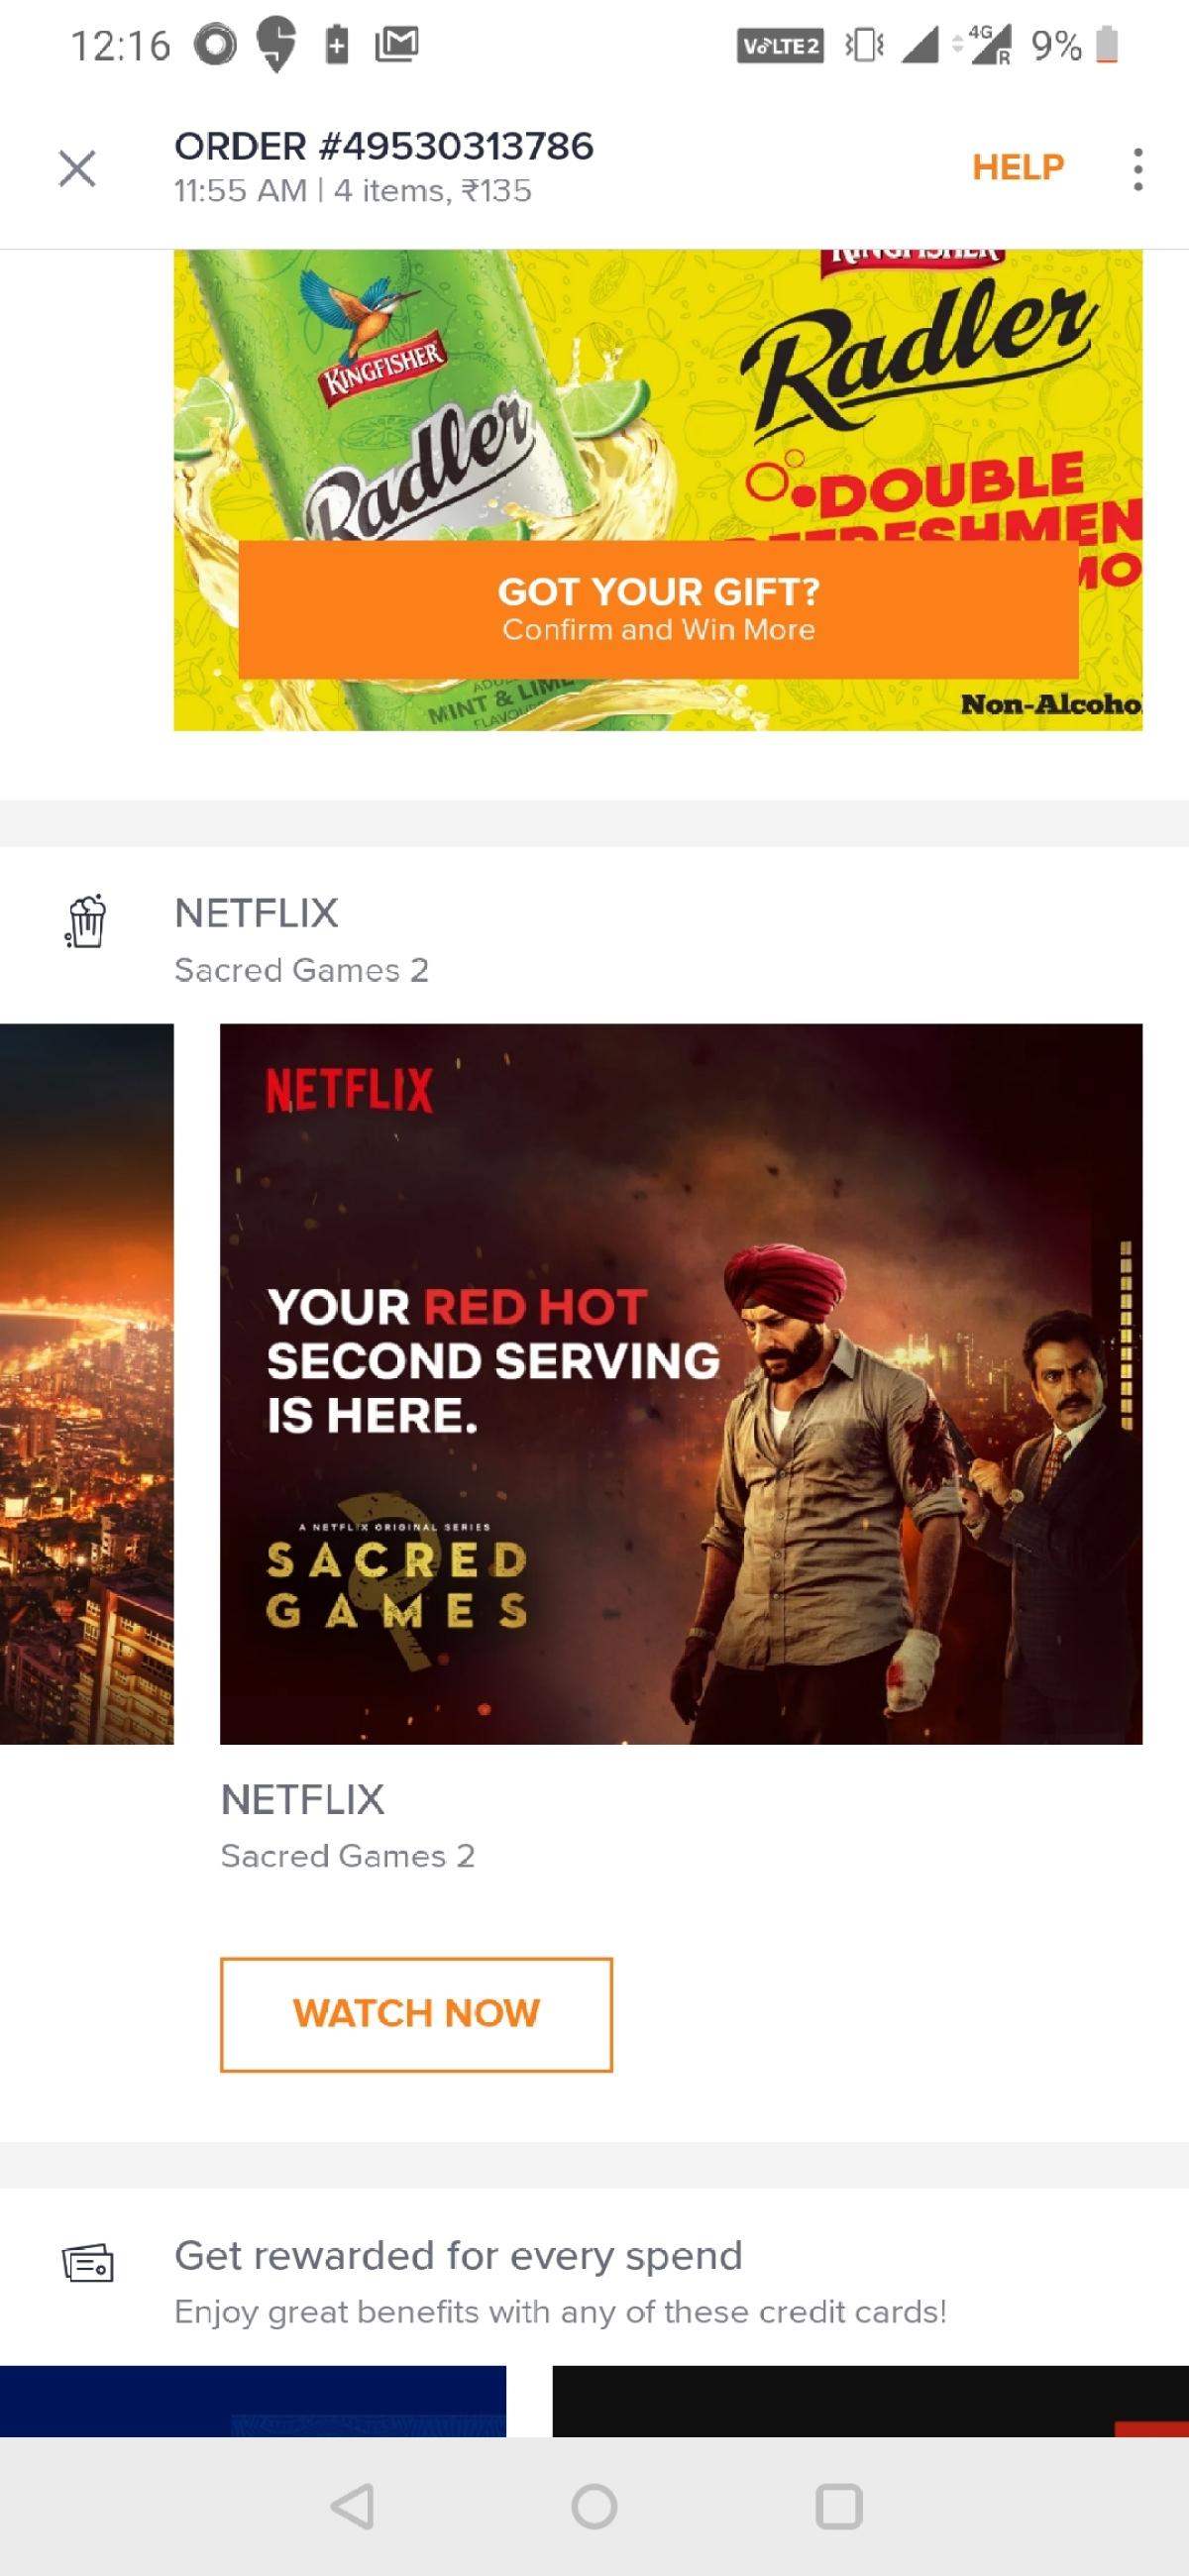 Swiggy displays Netflix's ad for Sacred Games